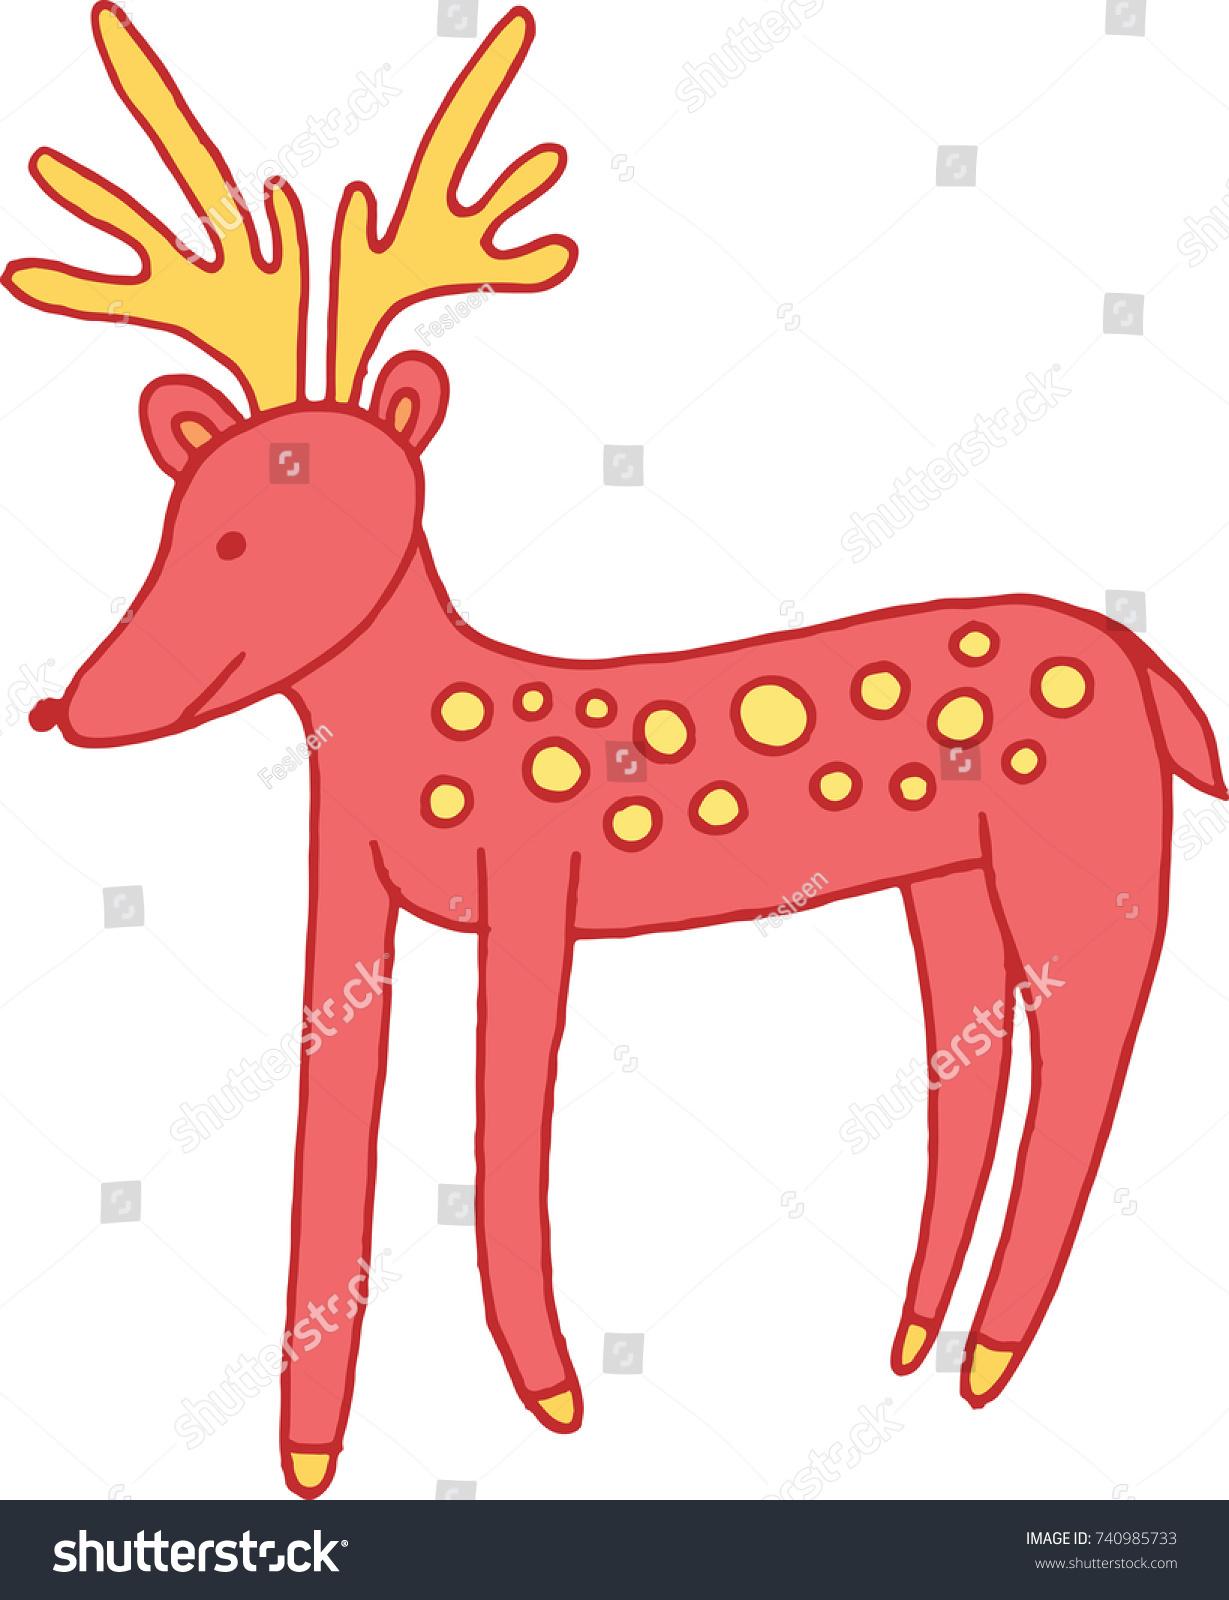 Forest Animal Deer Doodle Cartoon Simple Stock Vector 740985733 ...